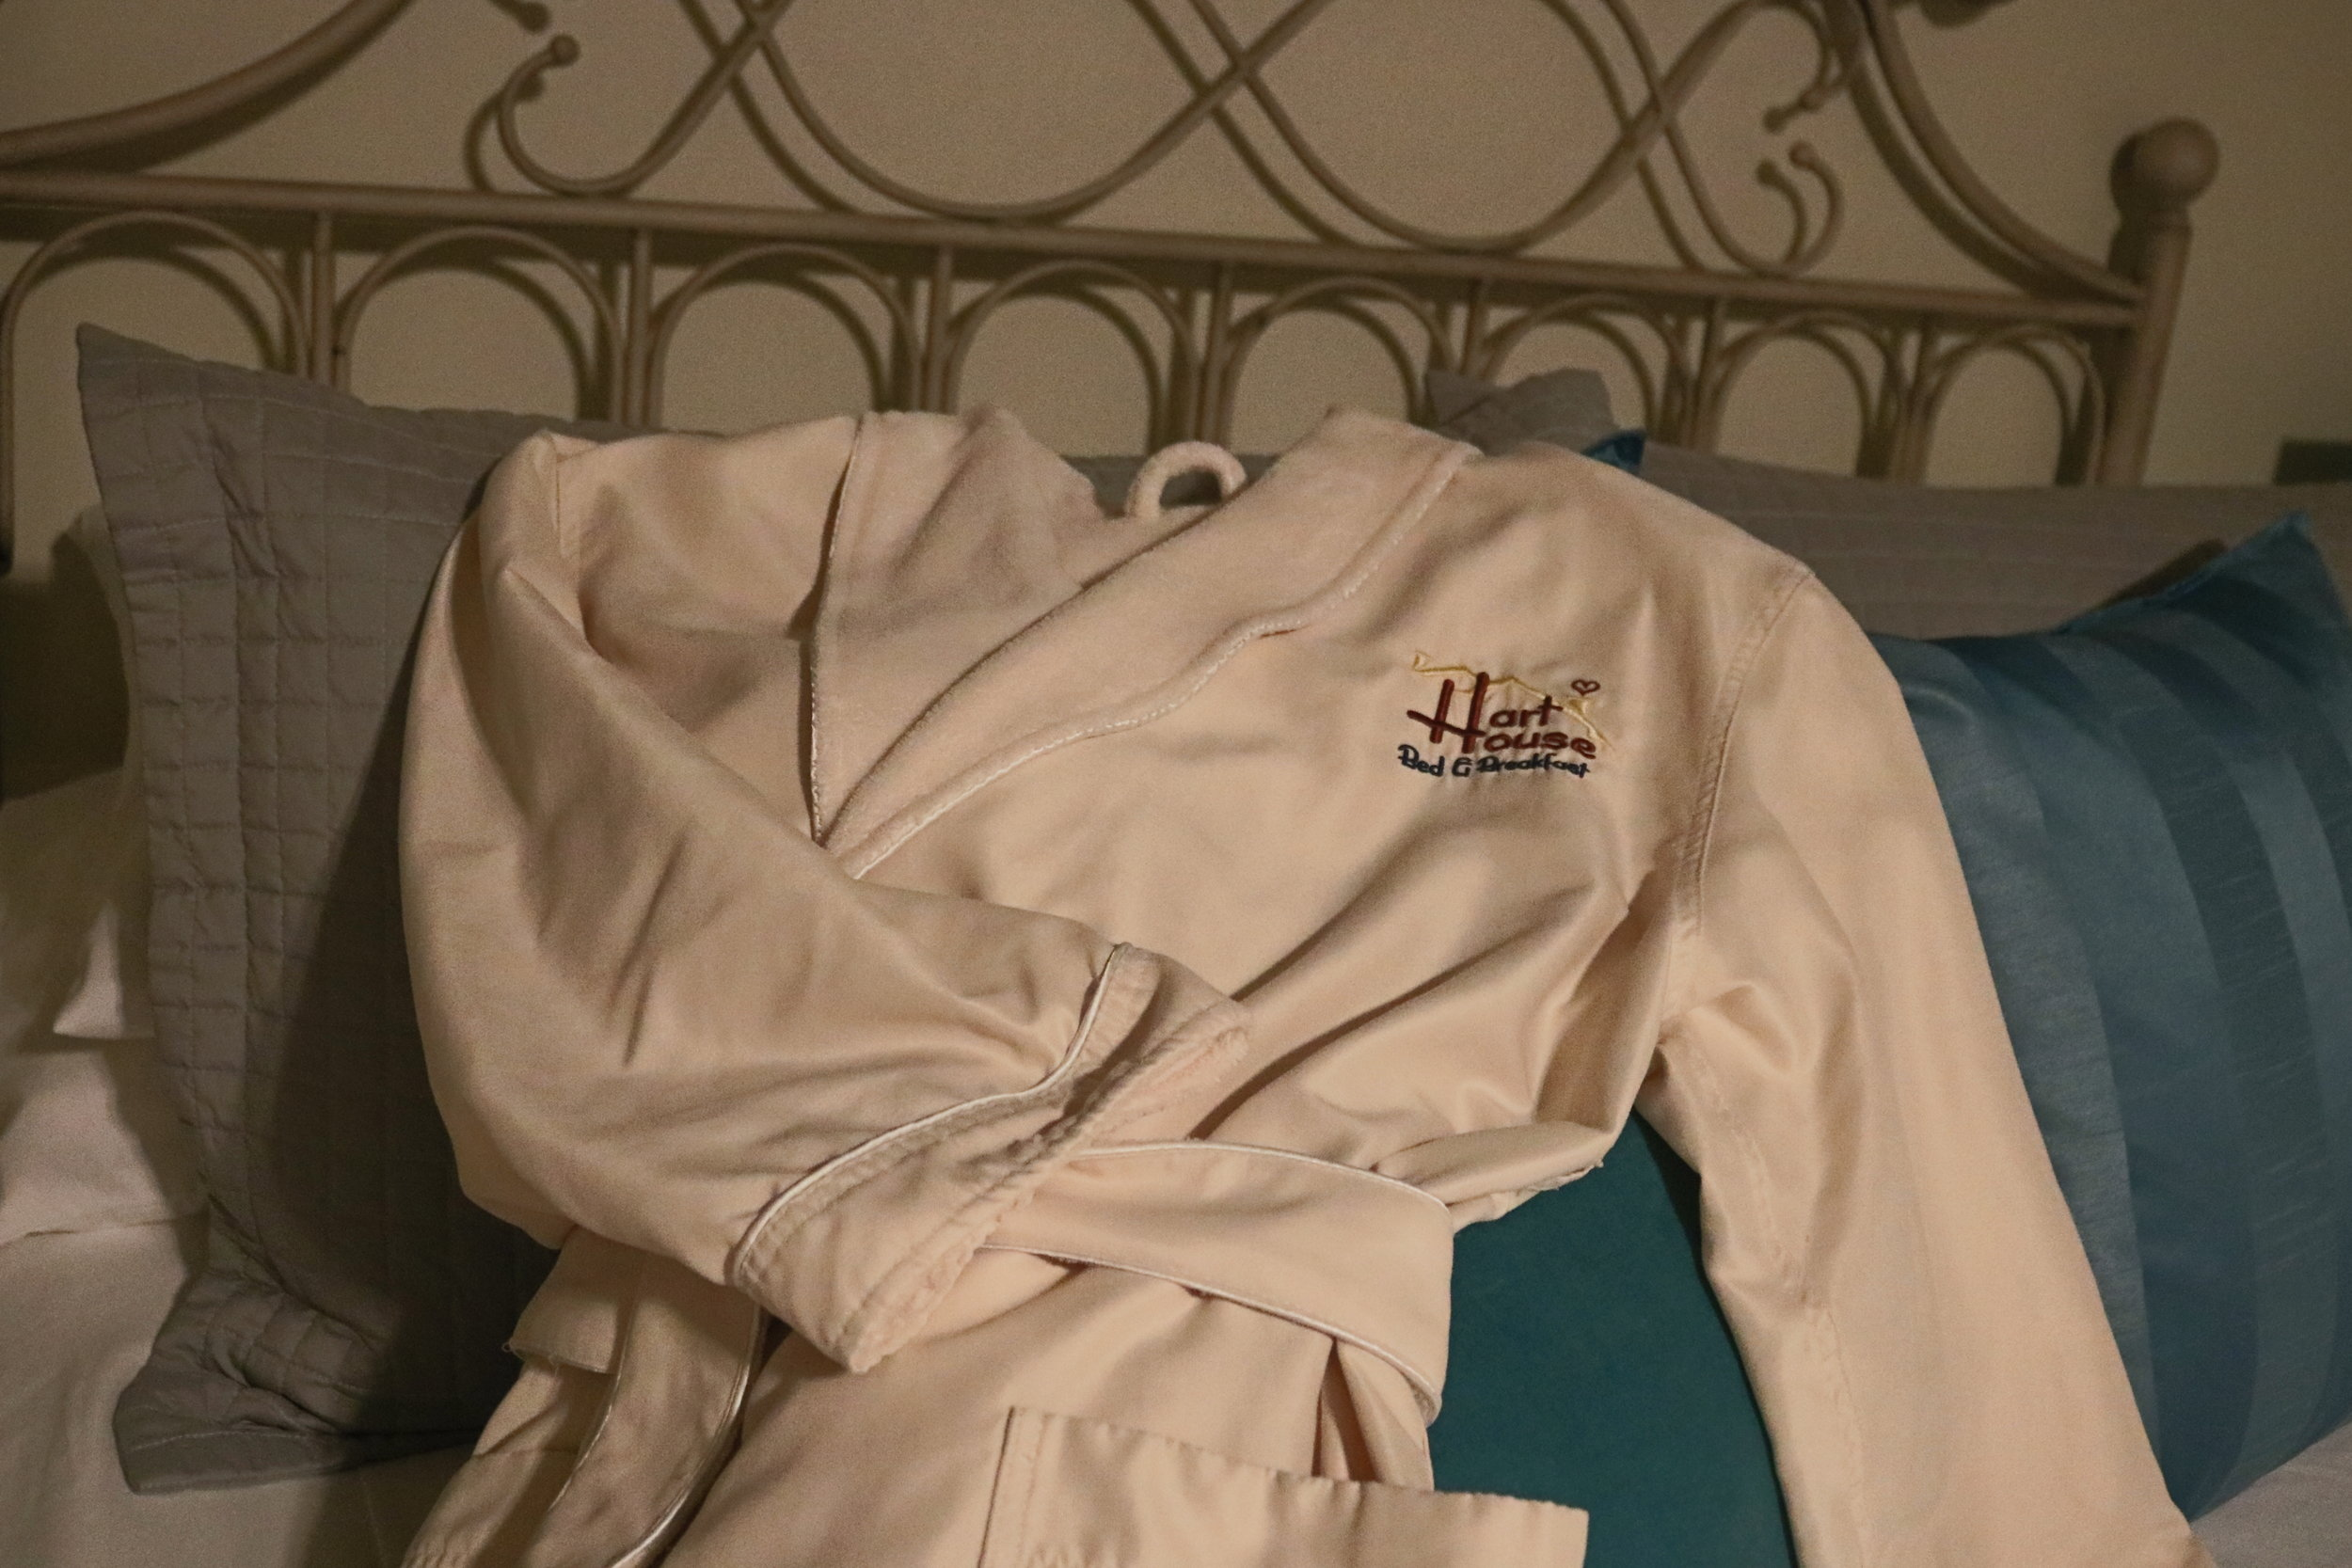 bathrobe provided